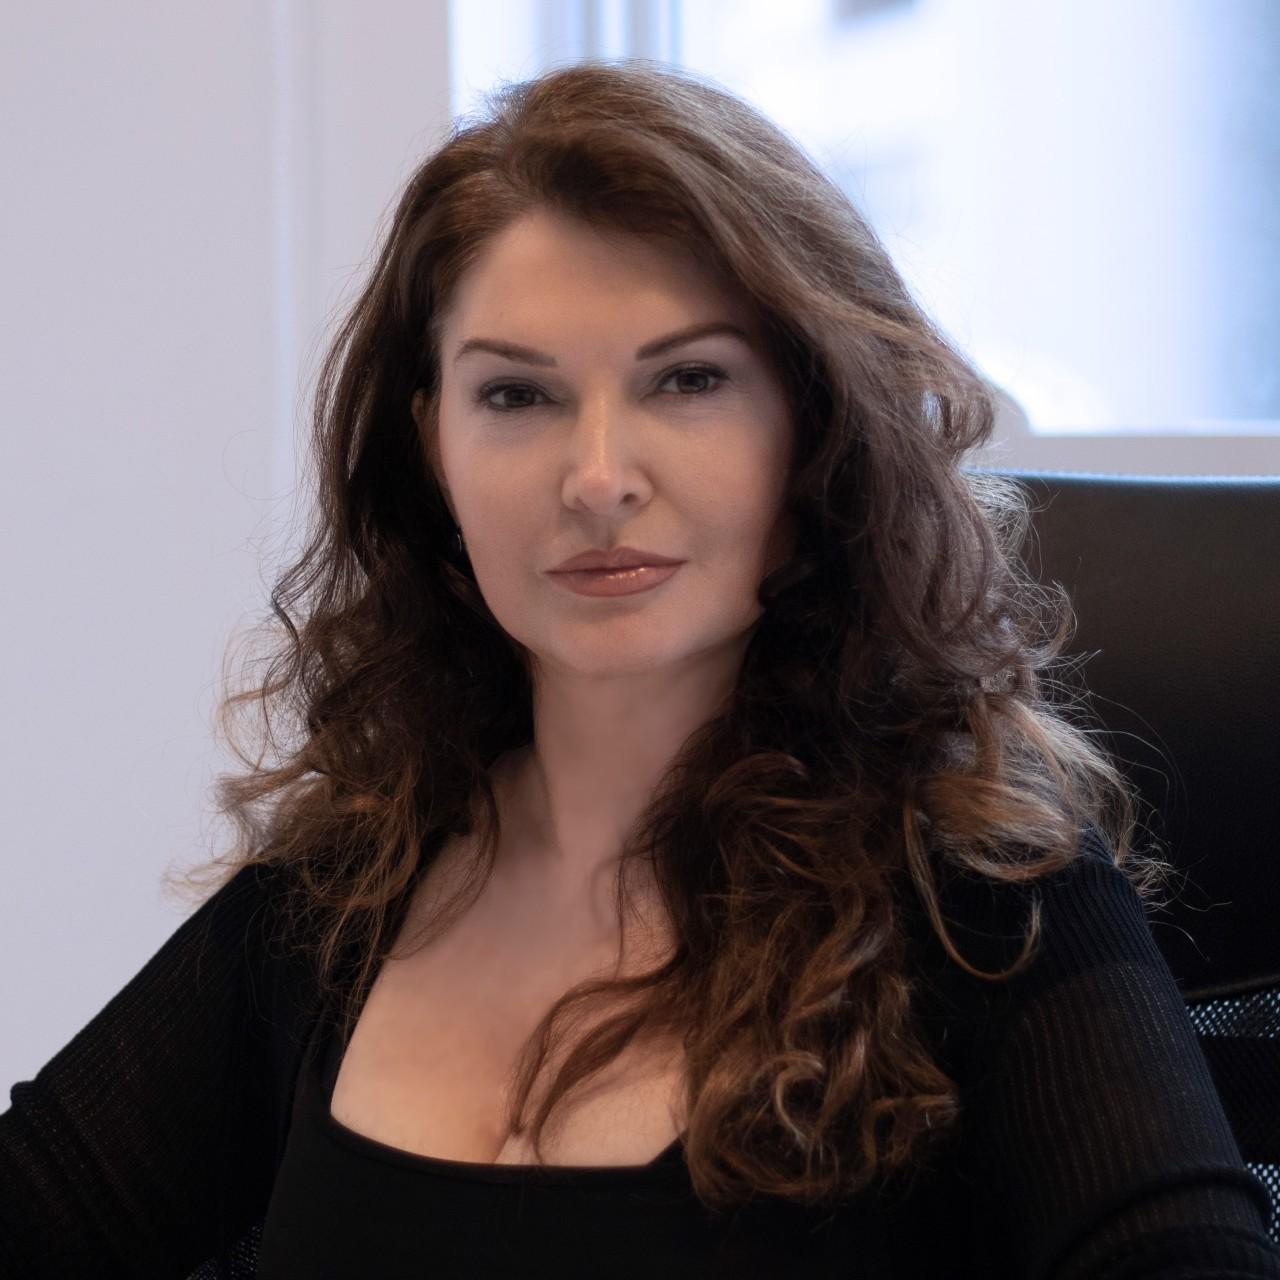 Susanna Marchionni - CEO of Planet Smart City in Brazil